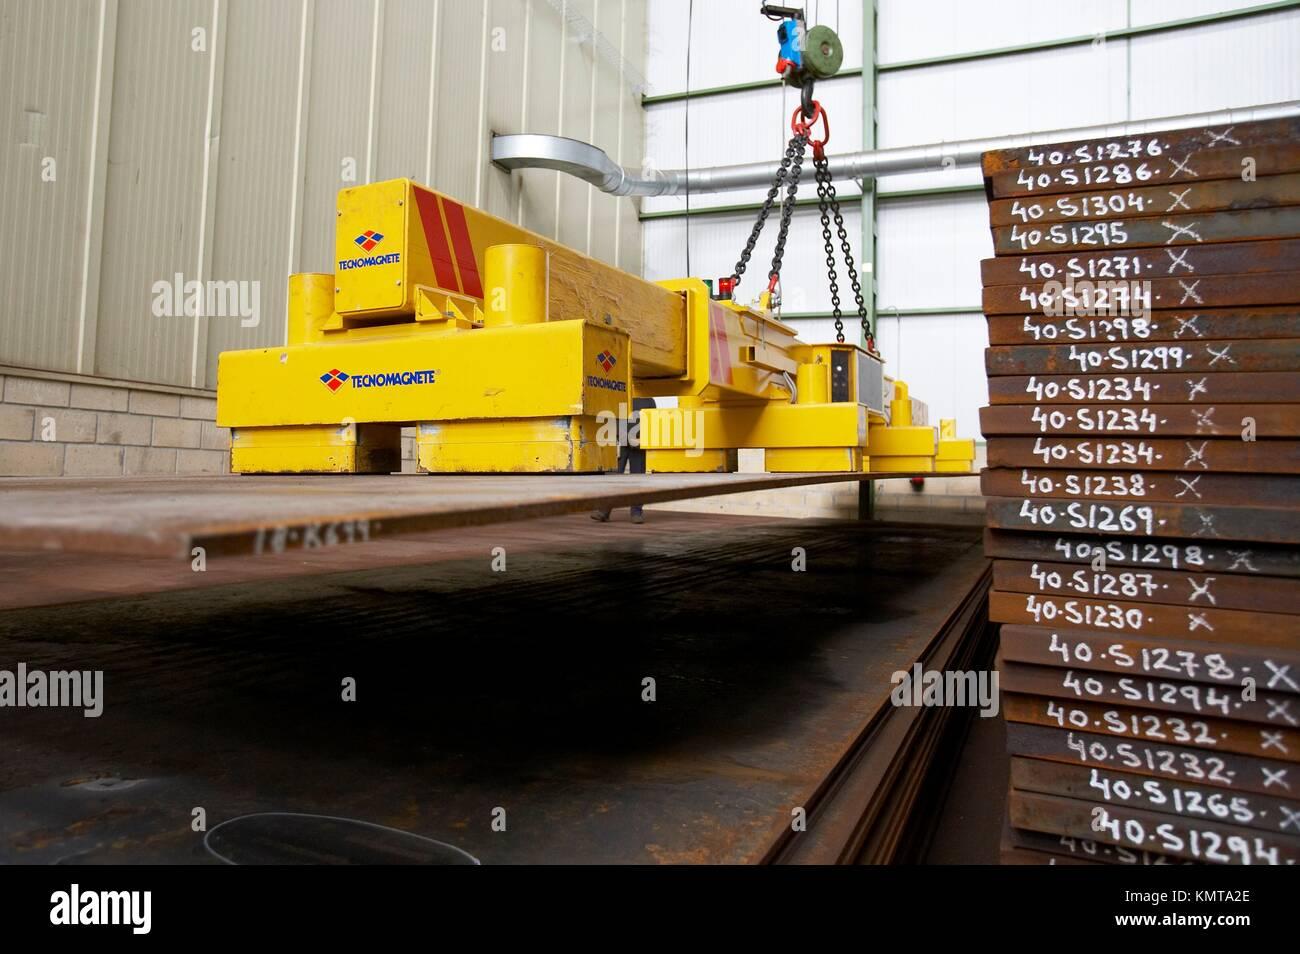 Telescopic electromagnetic crane for handling large steel plates Stock Photo